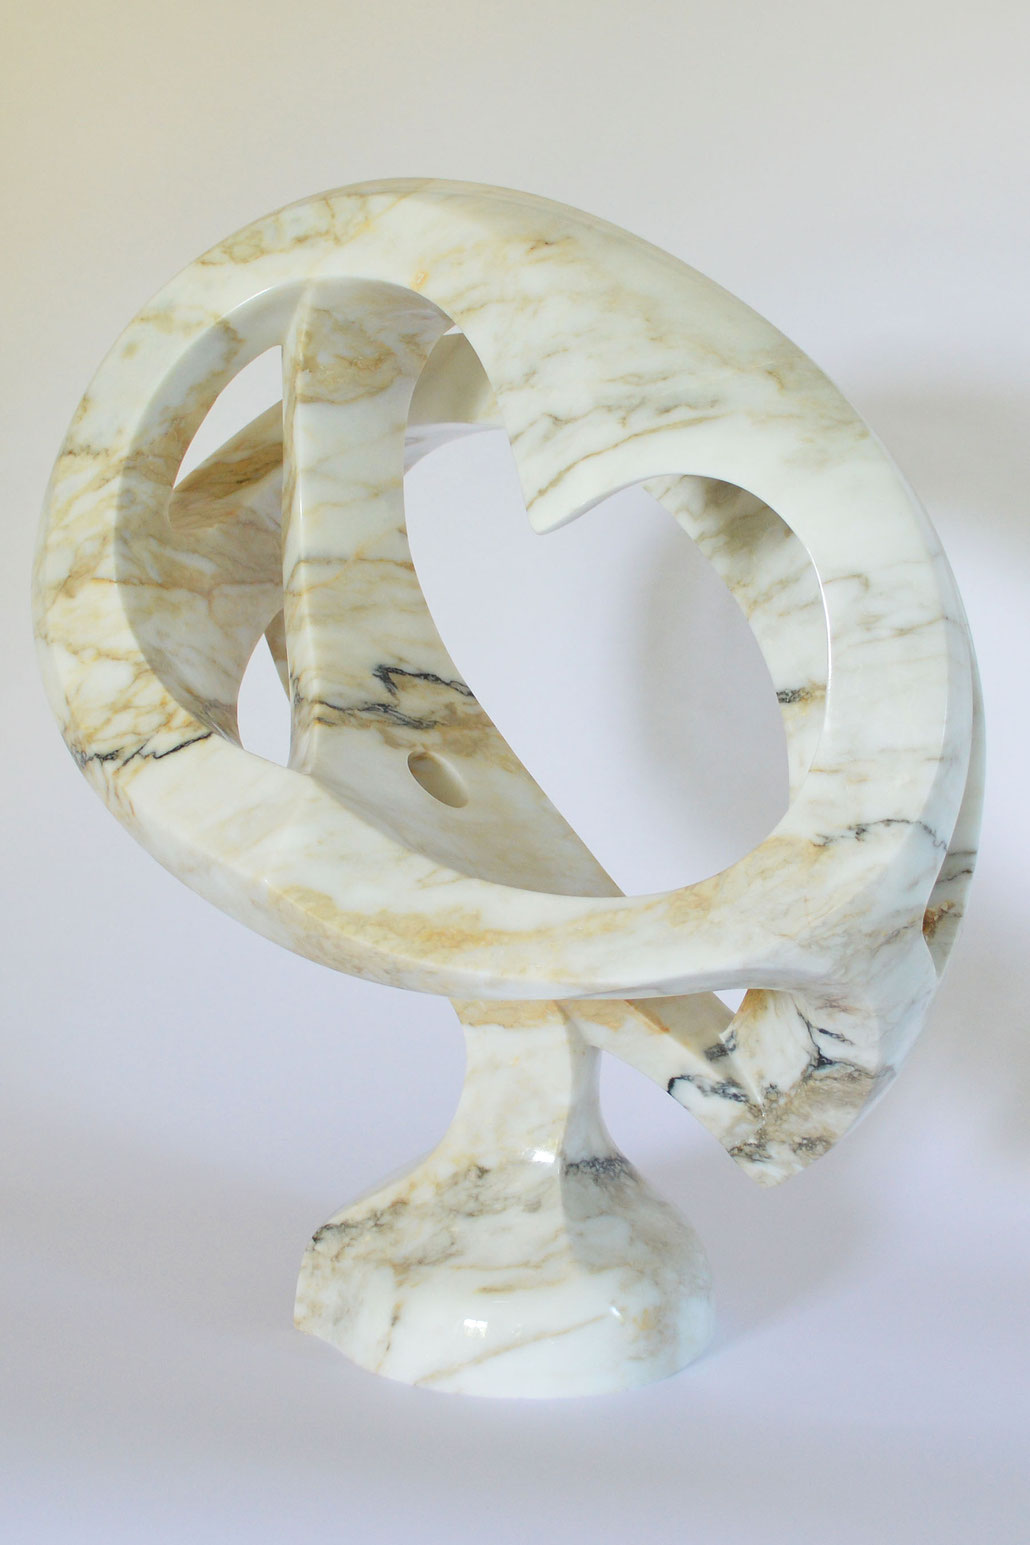 AUSTRALIA in Clacatta marble